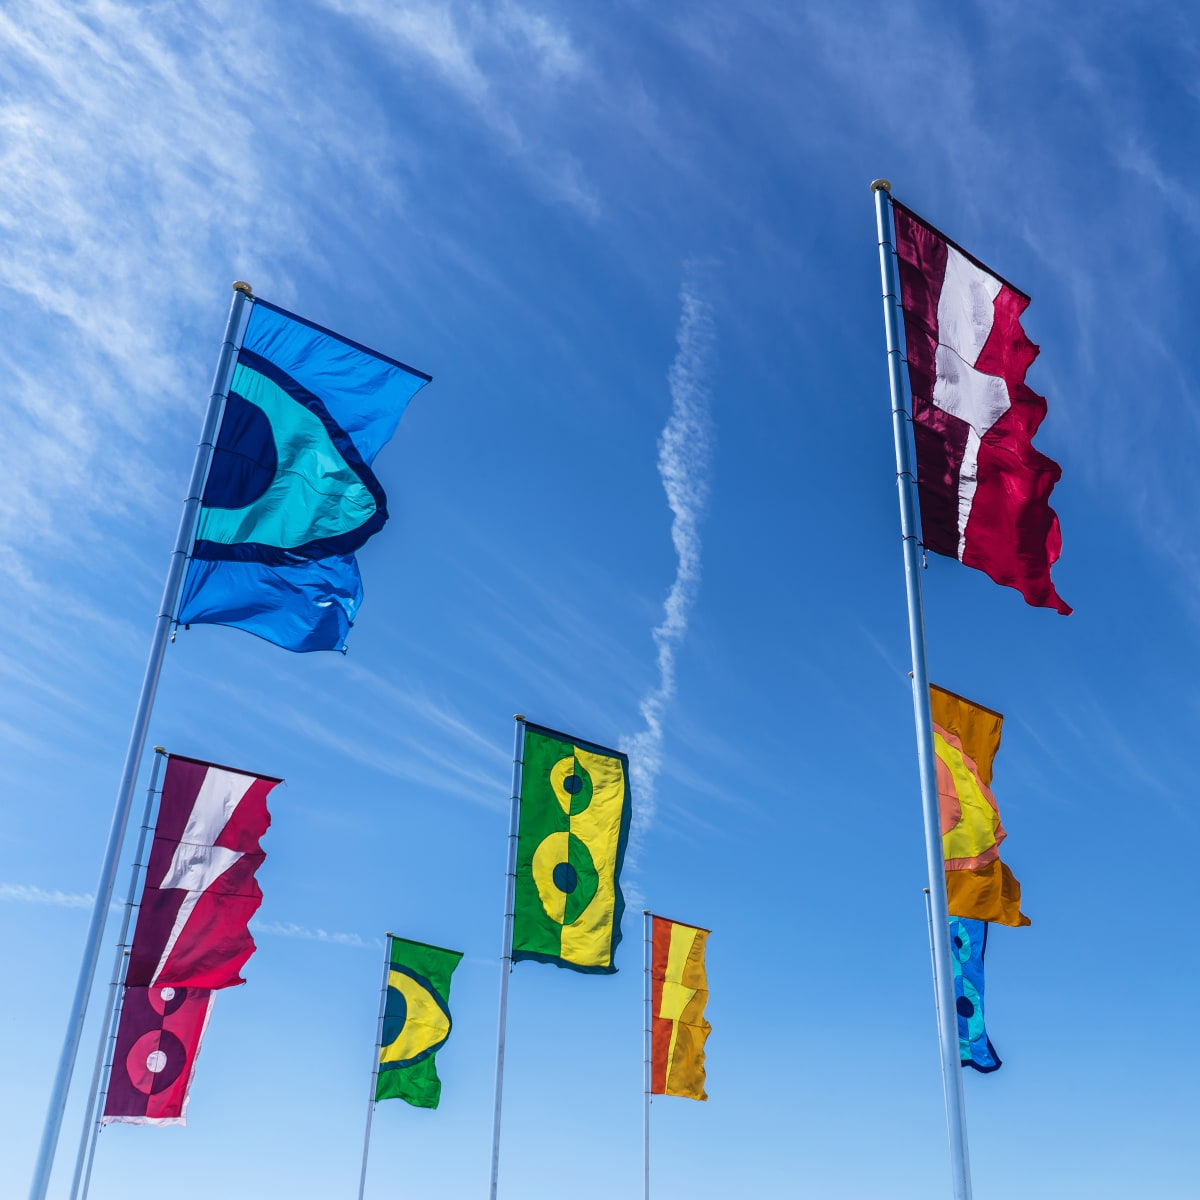 ACL Austin City Limits Music Festival 2016 flags